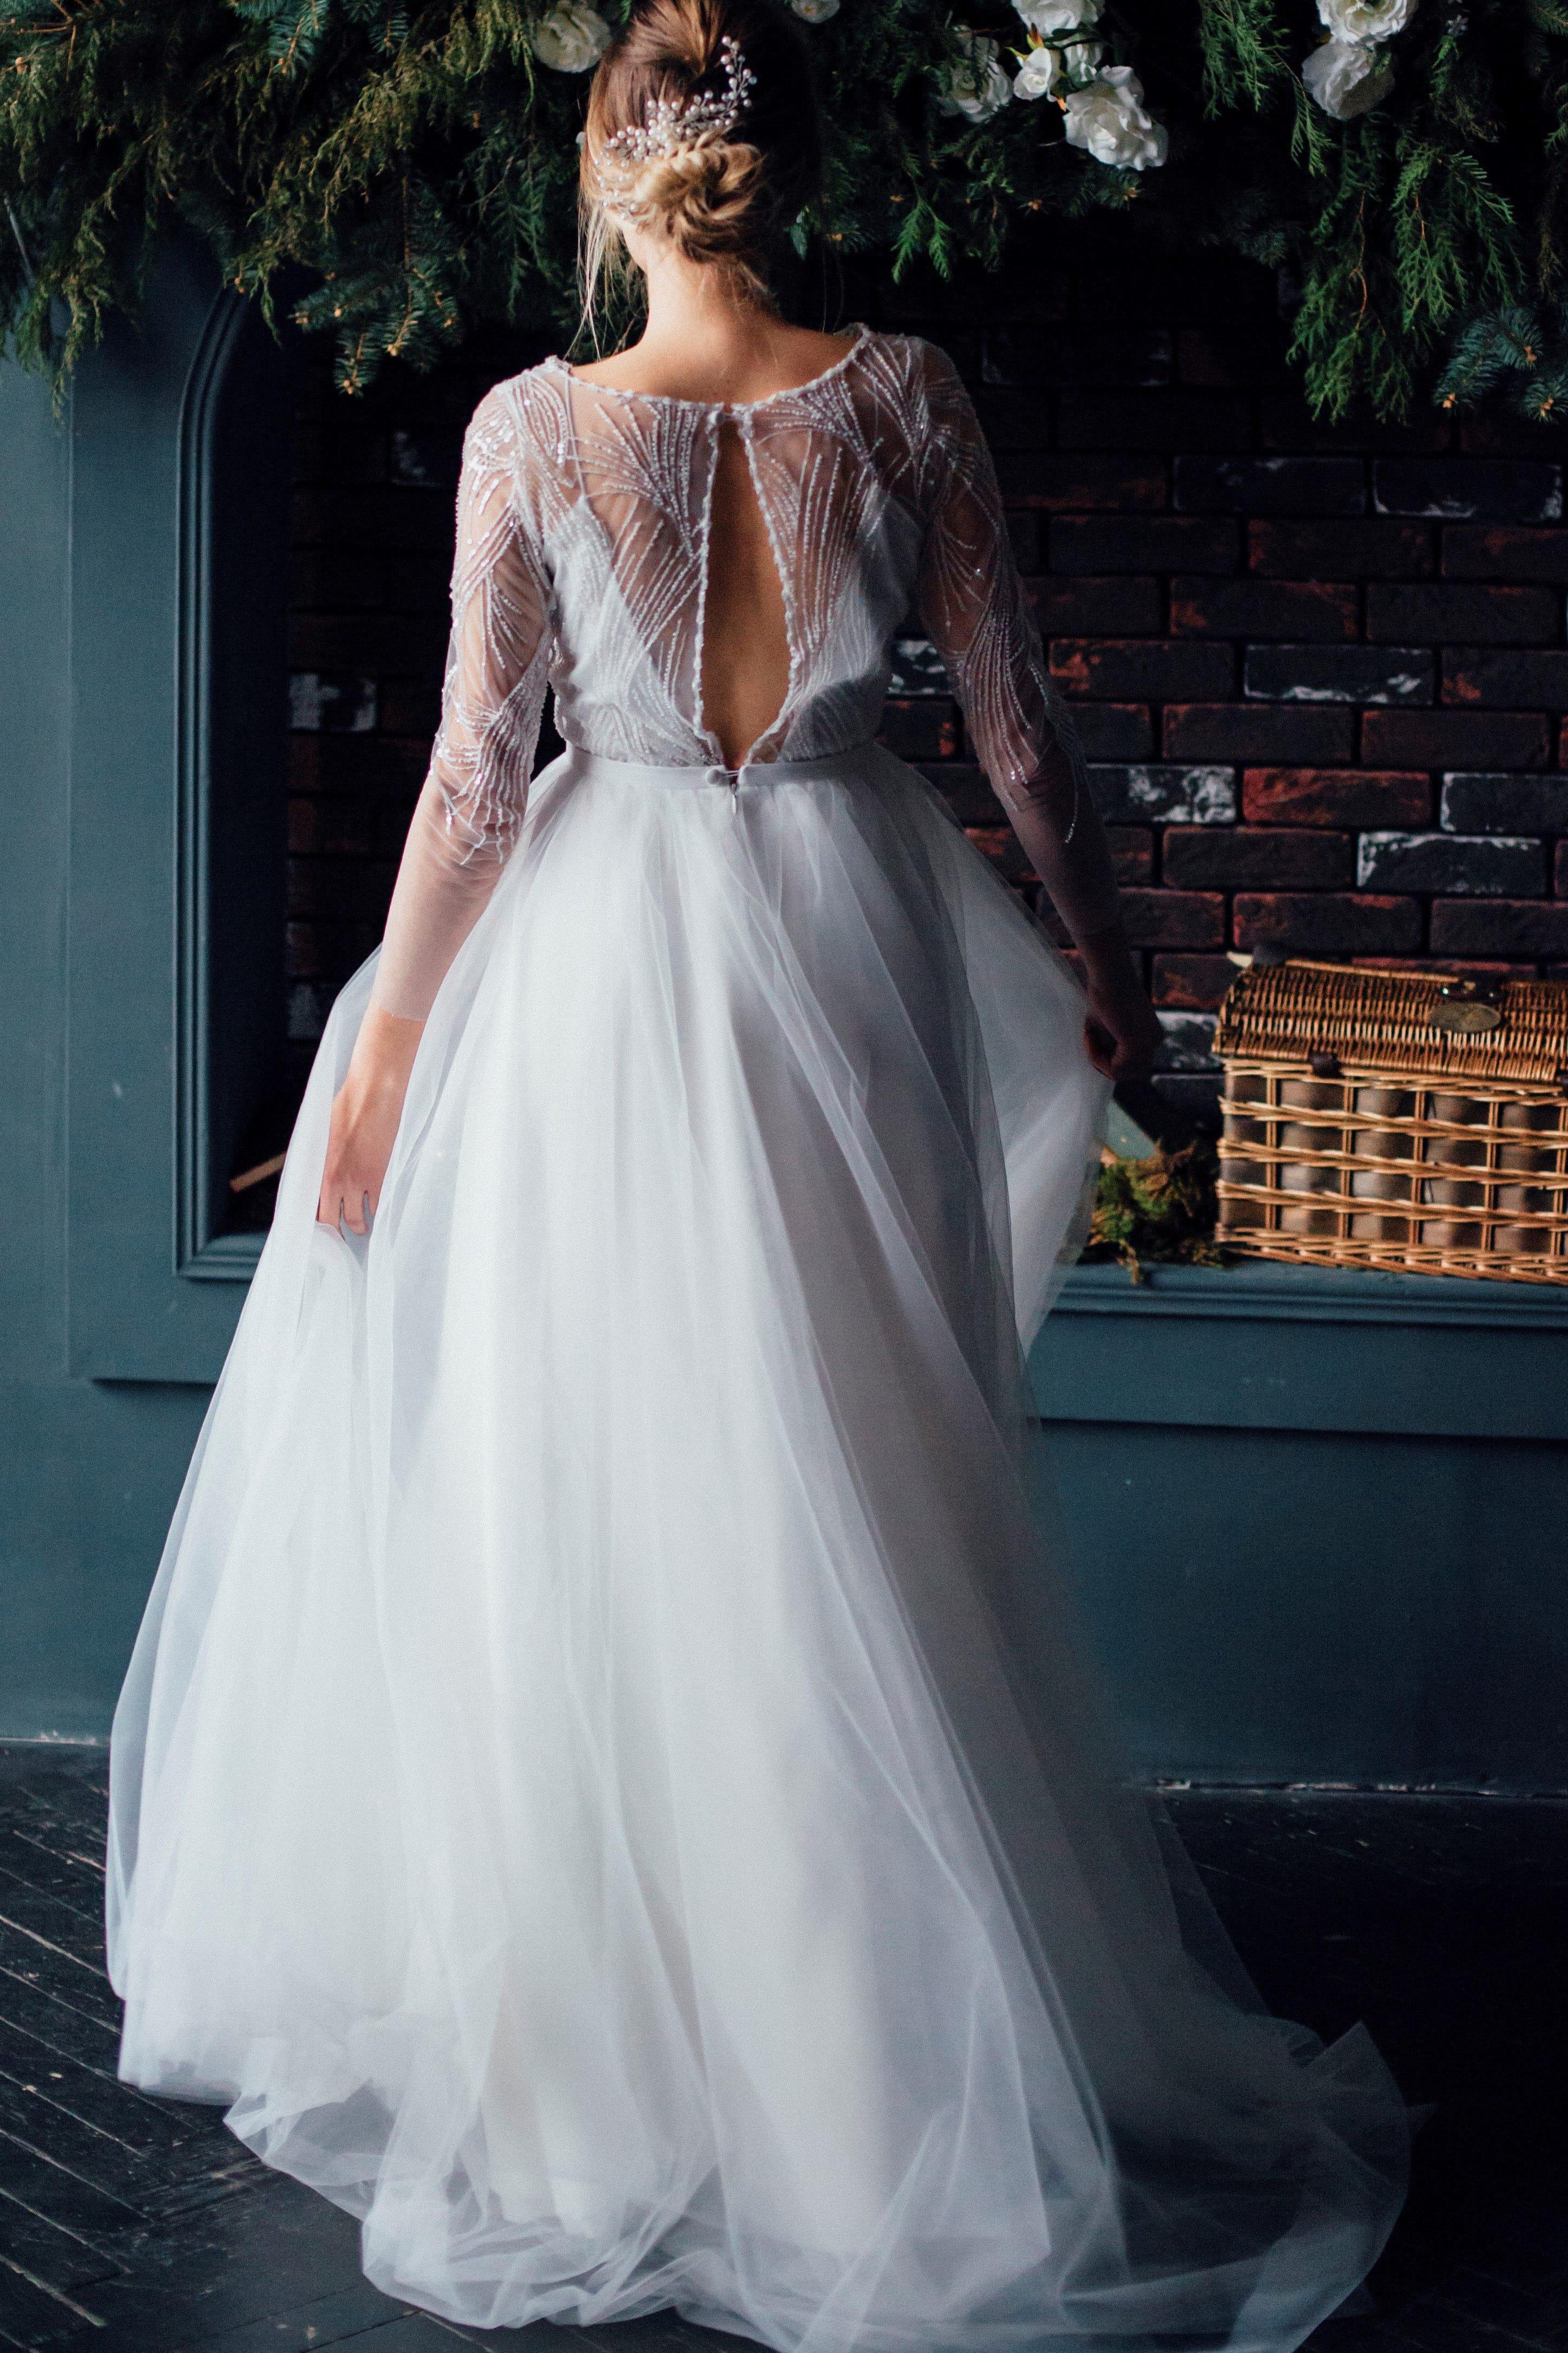 Свадебное платье EVELYN, коллекция THE ABSOLUTE LOVE, бренд RARE BRIDAL, фото 1